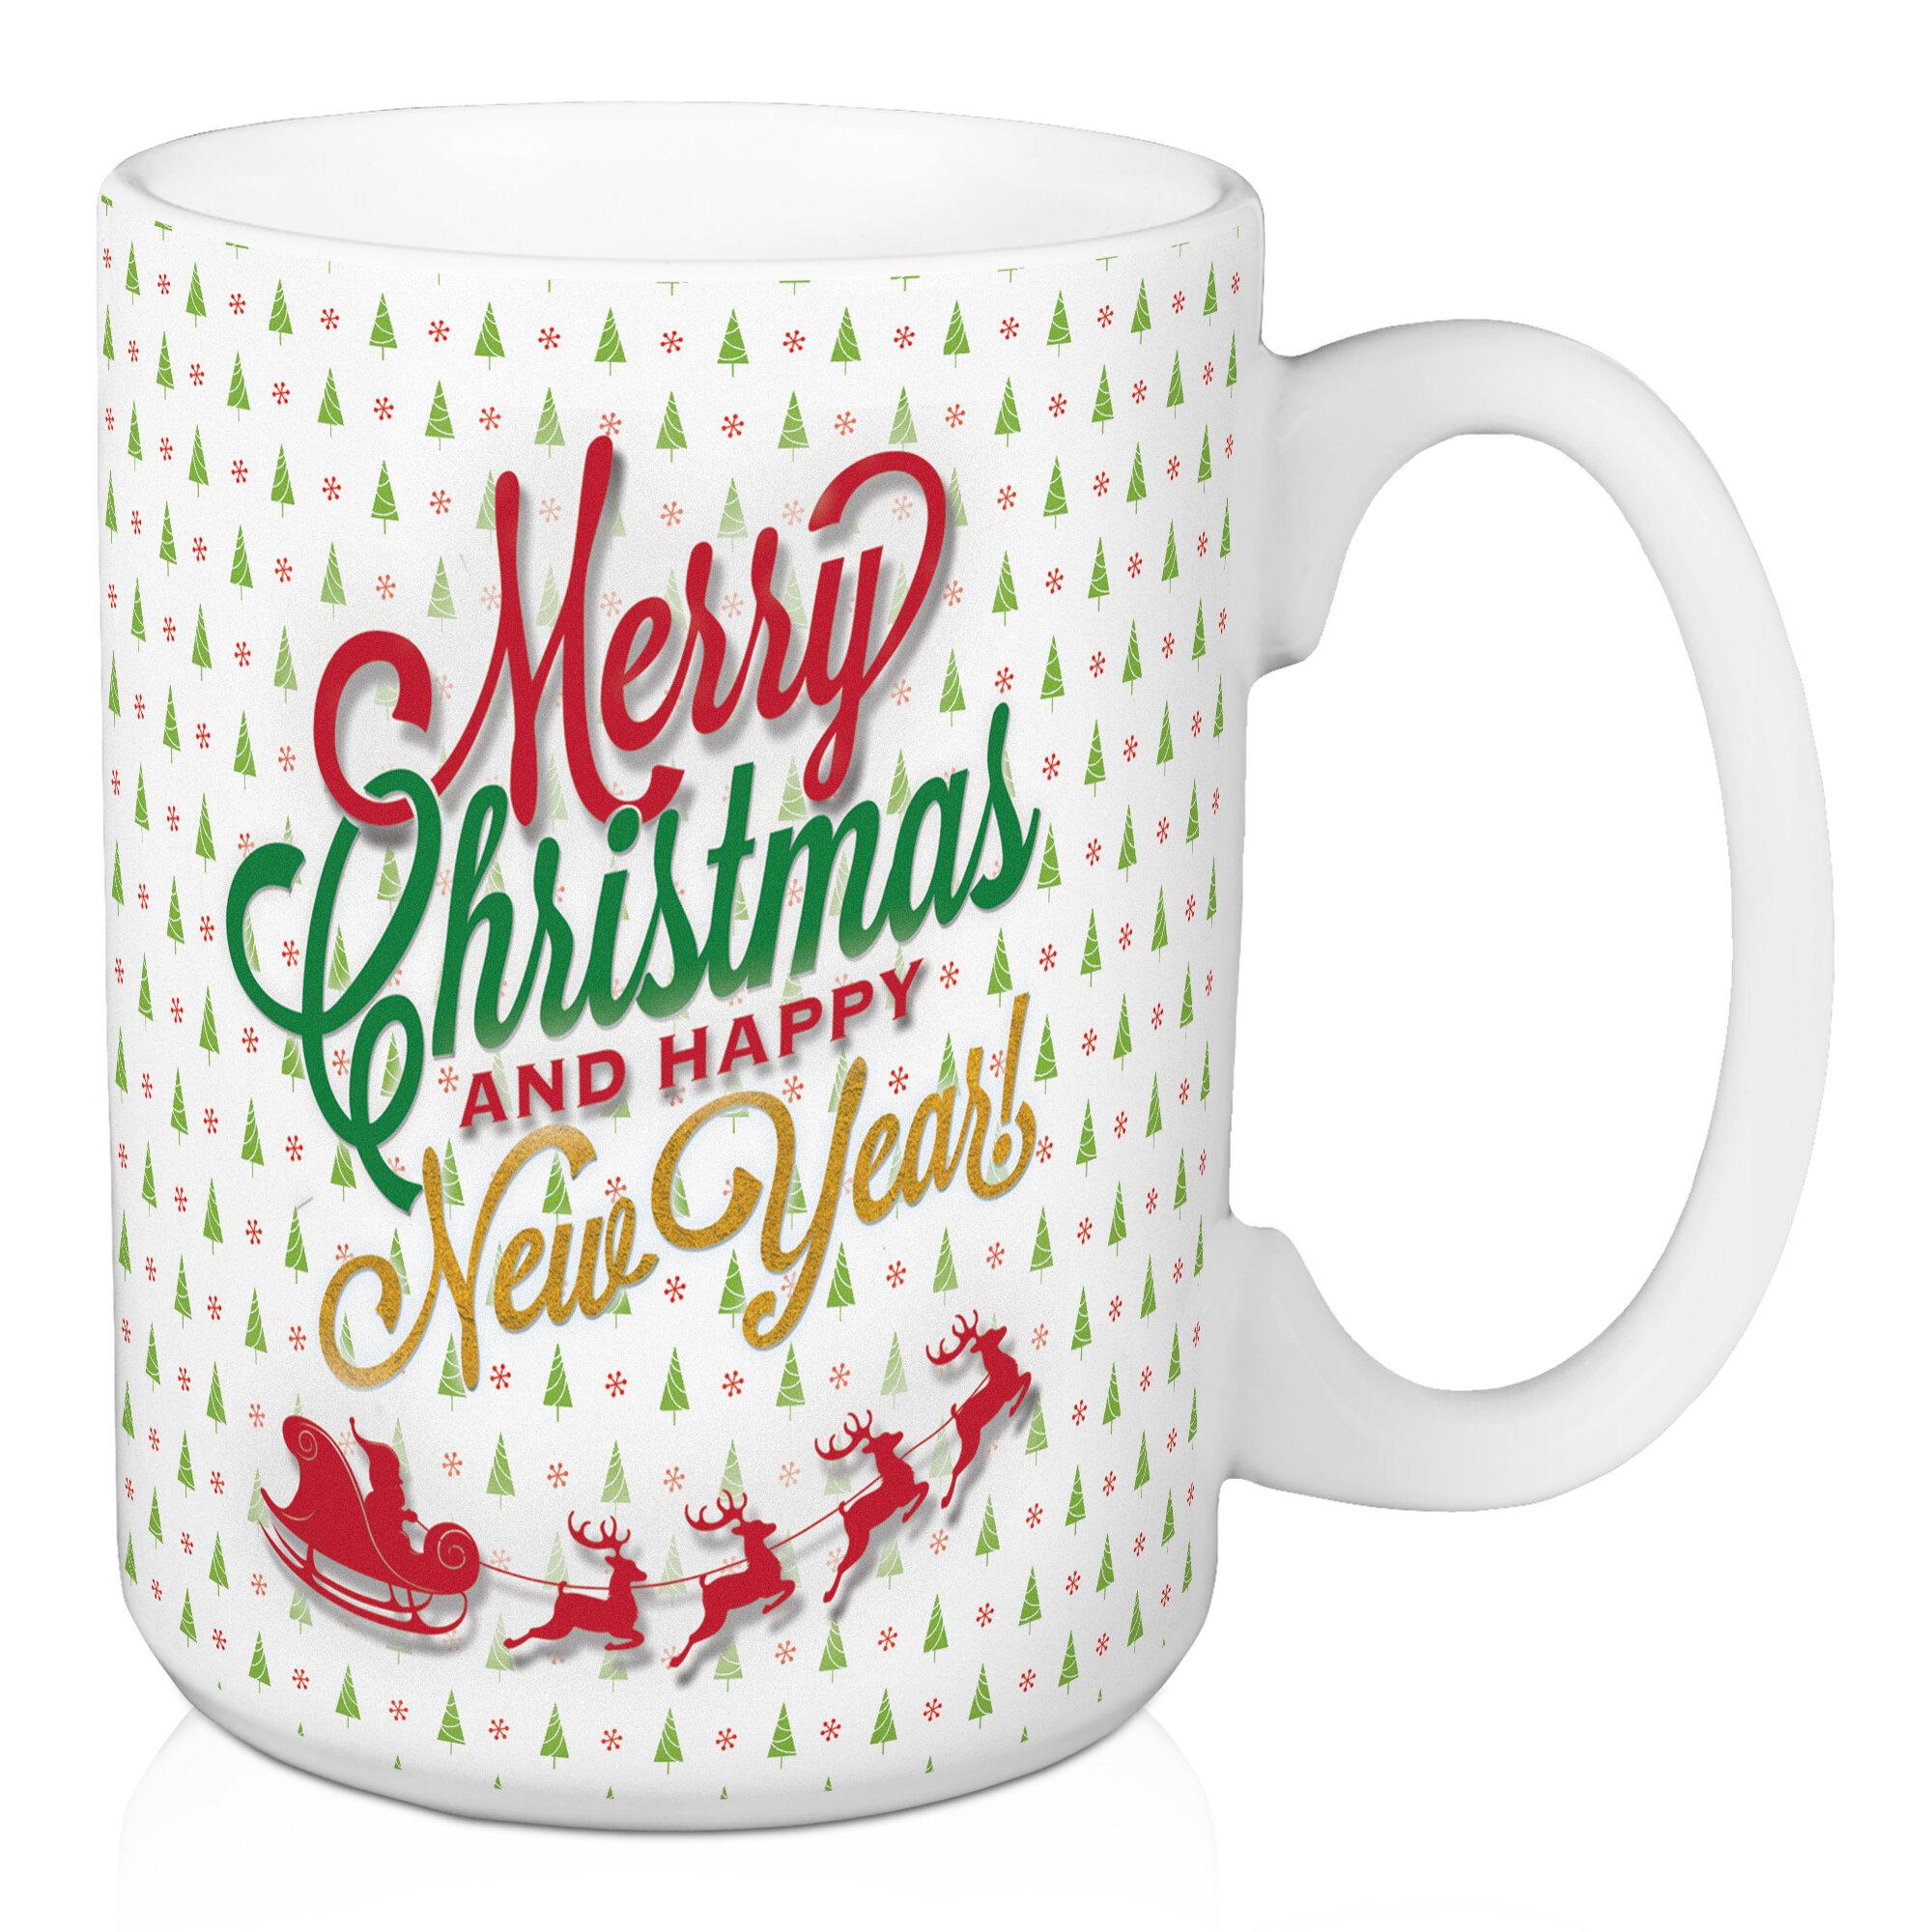 The Holiday Aisle Merry Christmas And Happy New Year Coffee Mug Wayfair